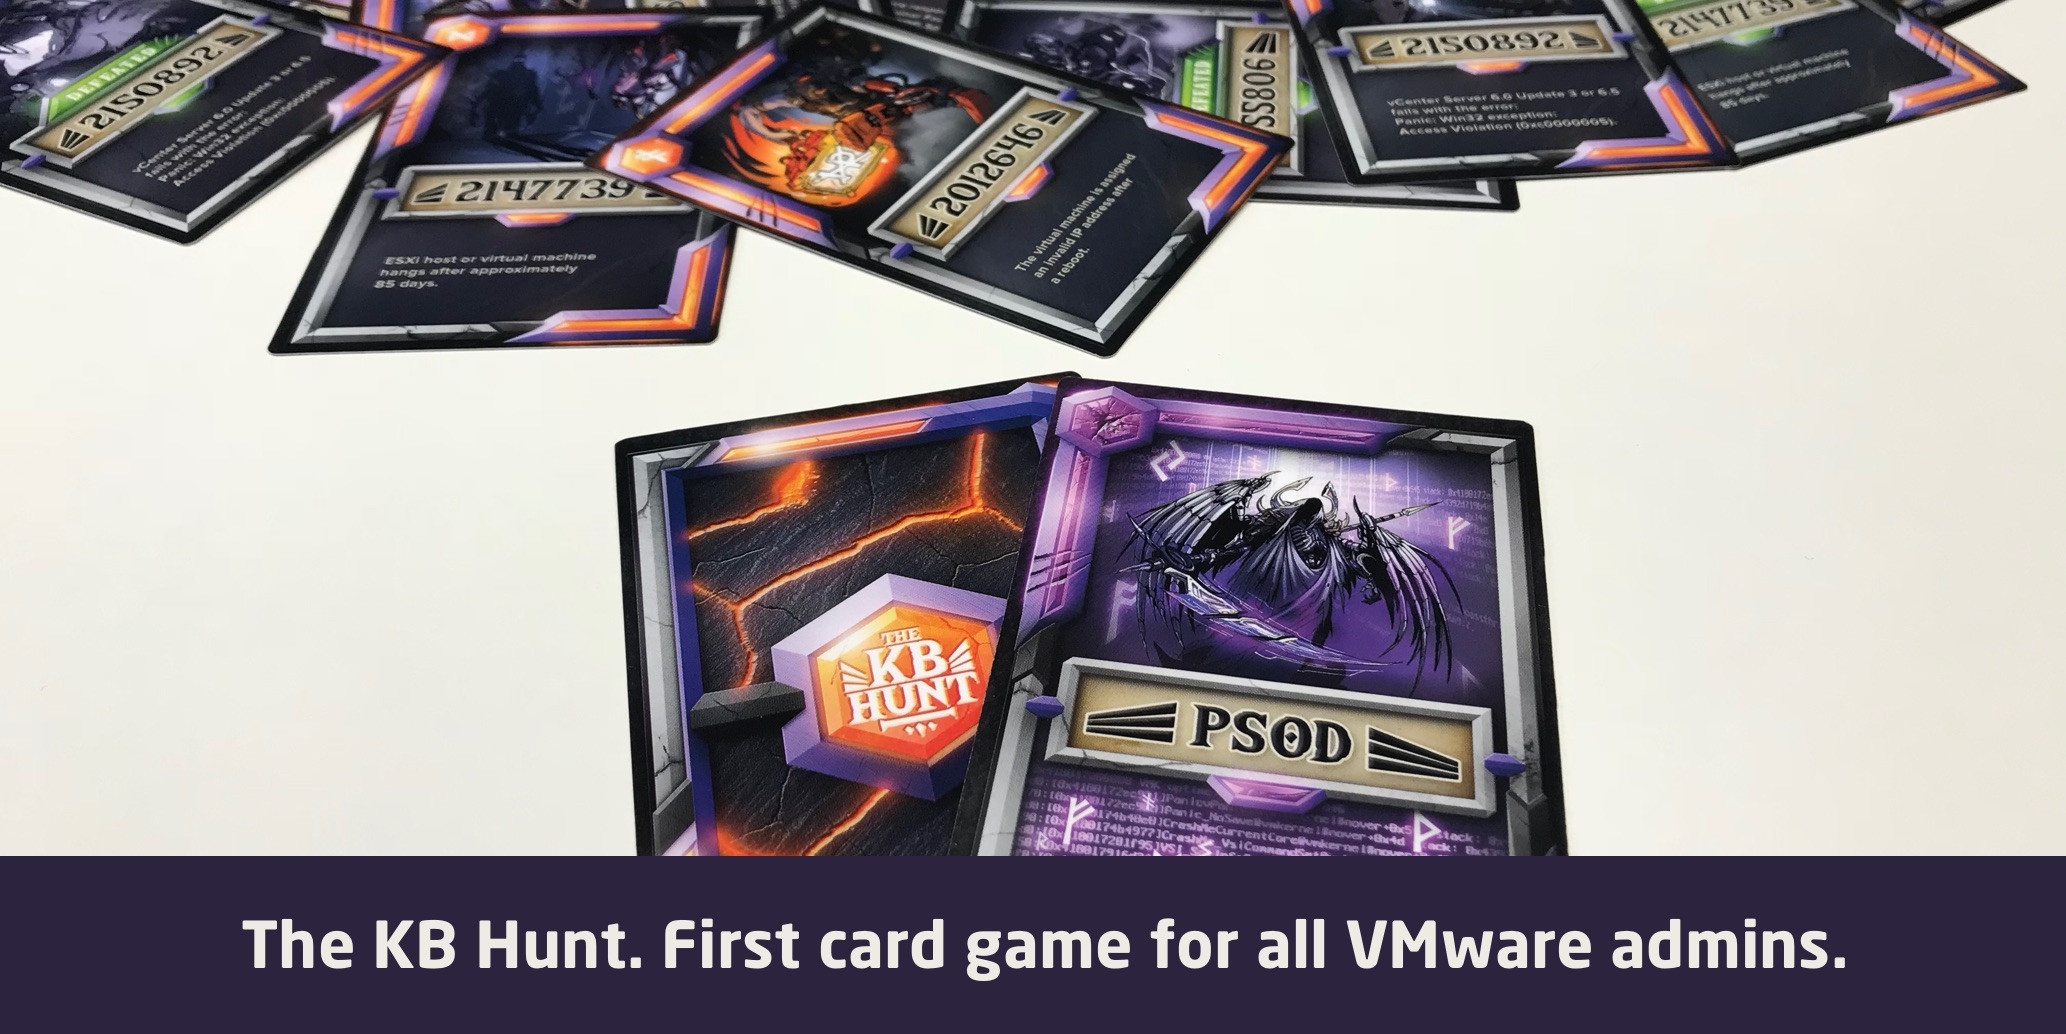 KB Hunt VMware admin card game